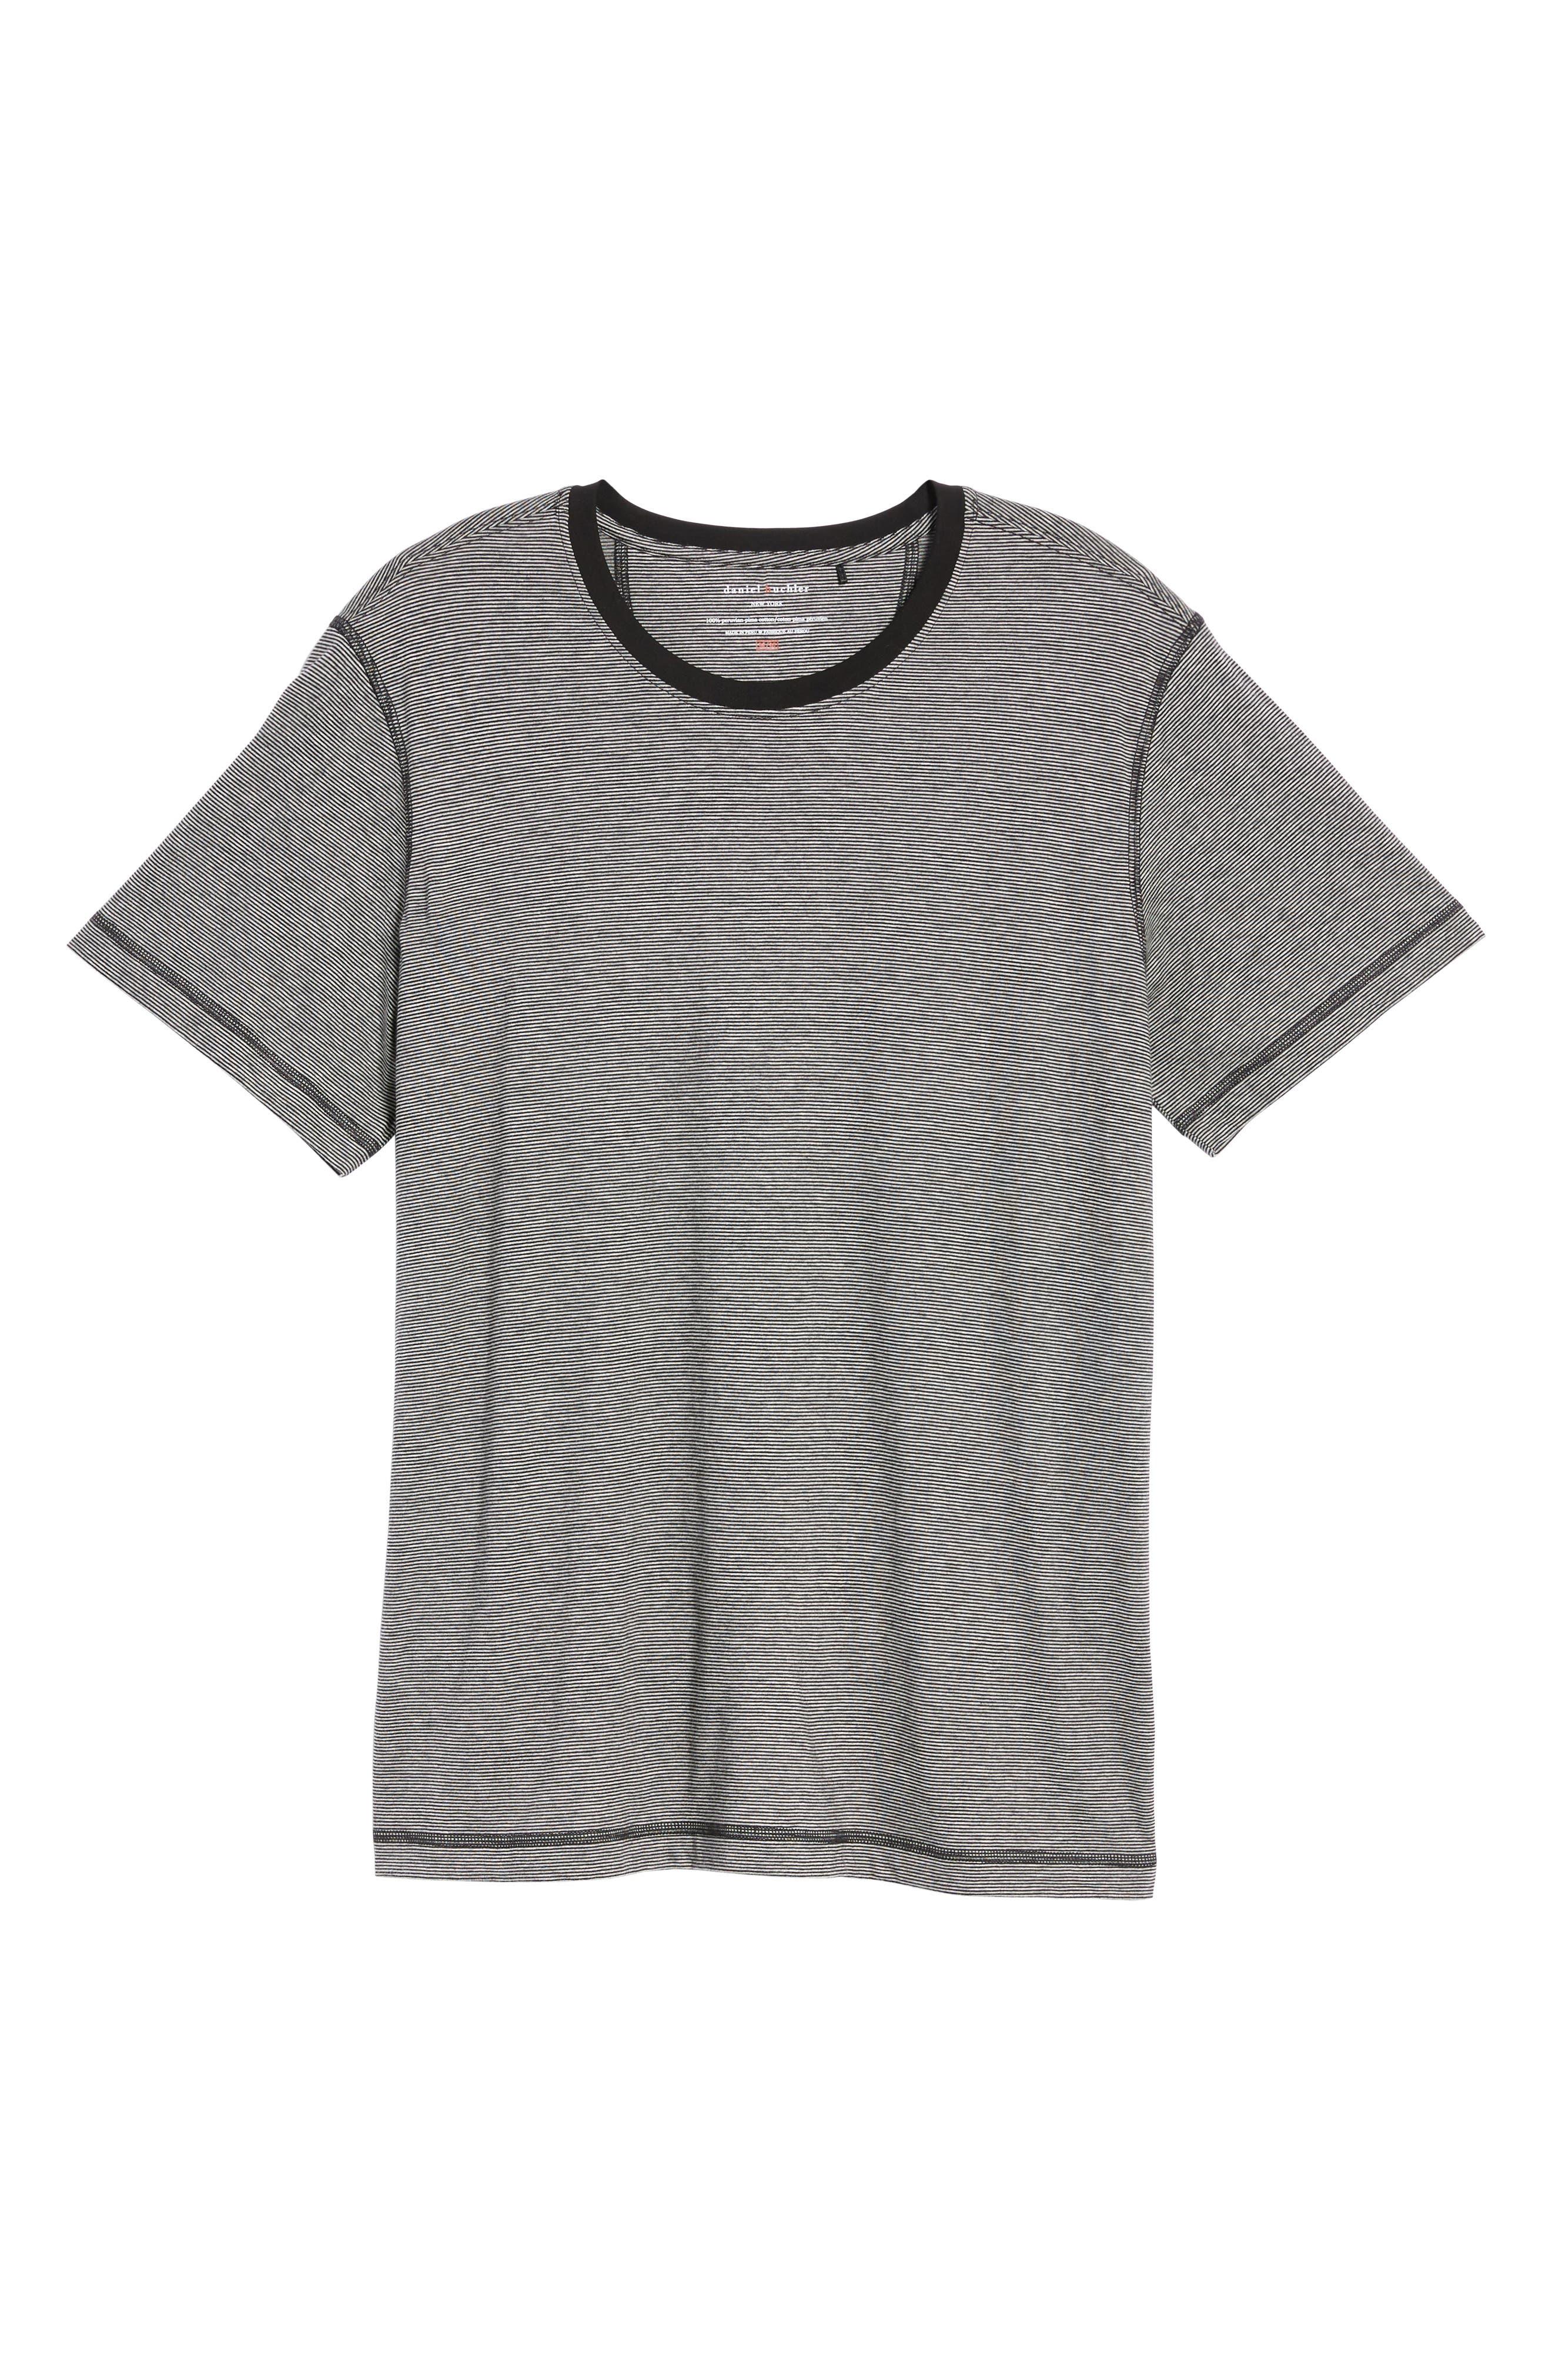 Peruvian Pima Cotton T-Shirt,                             Alternate thumbnail 5, color,                             Black/ Grey Heather